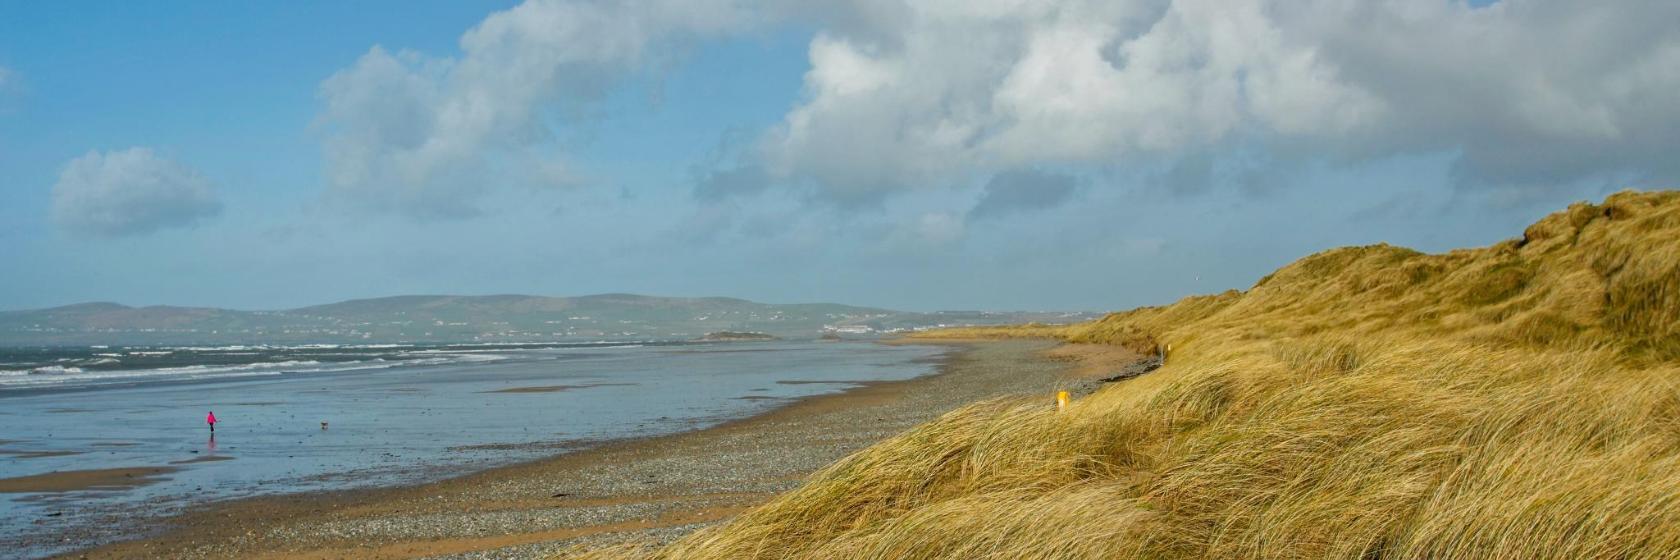 Banna Strand (Tralee) - Tralee, Ireland - TripAdvisor